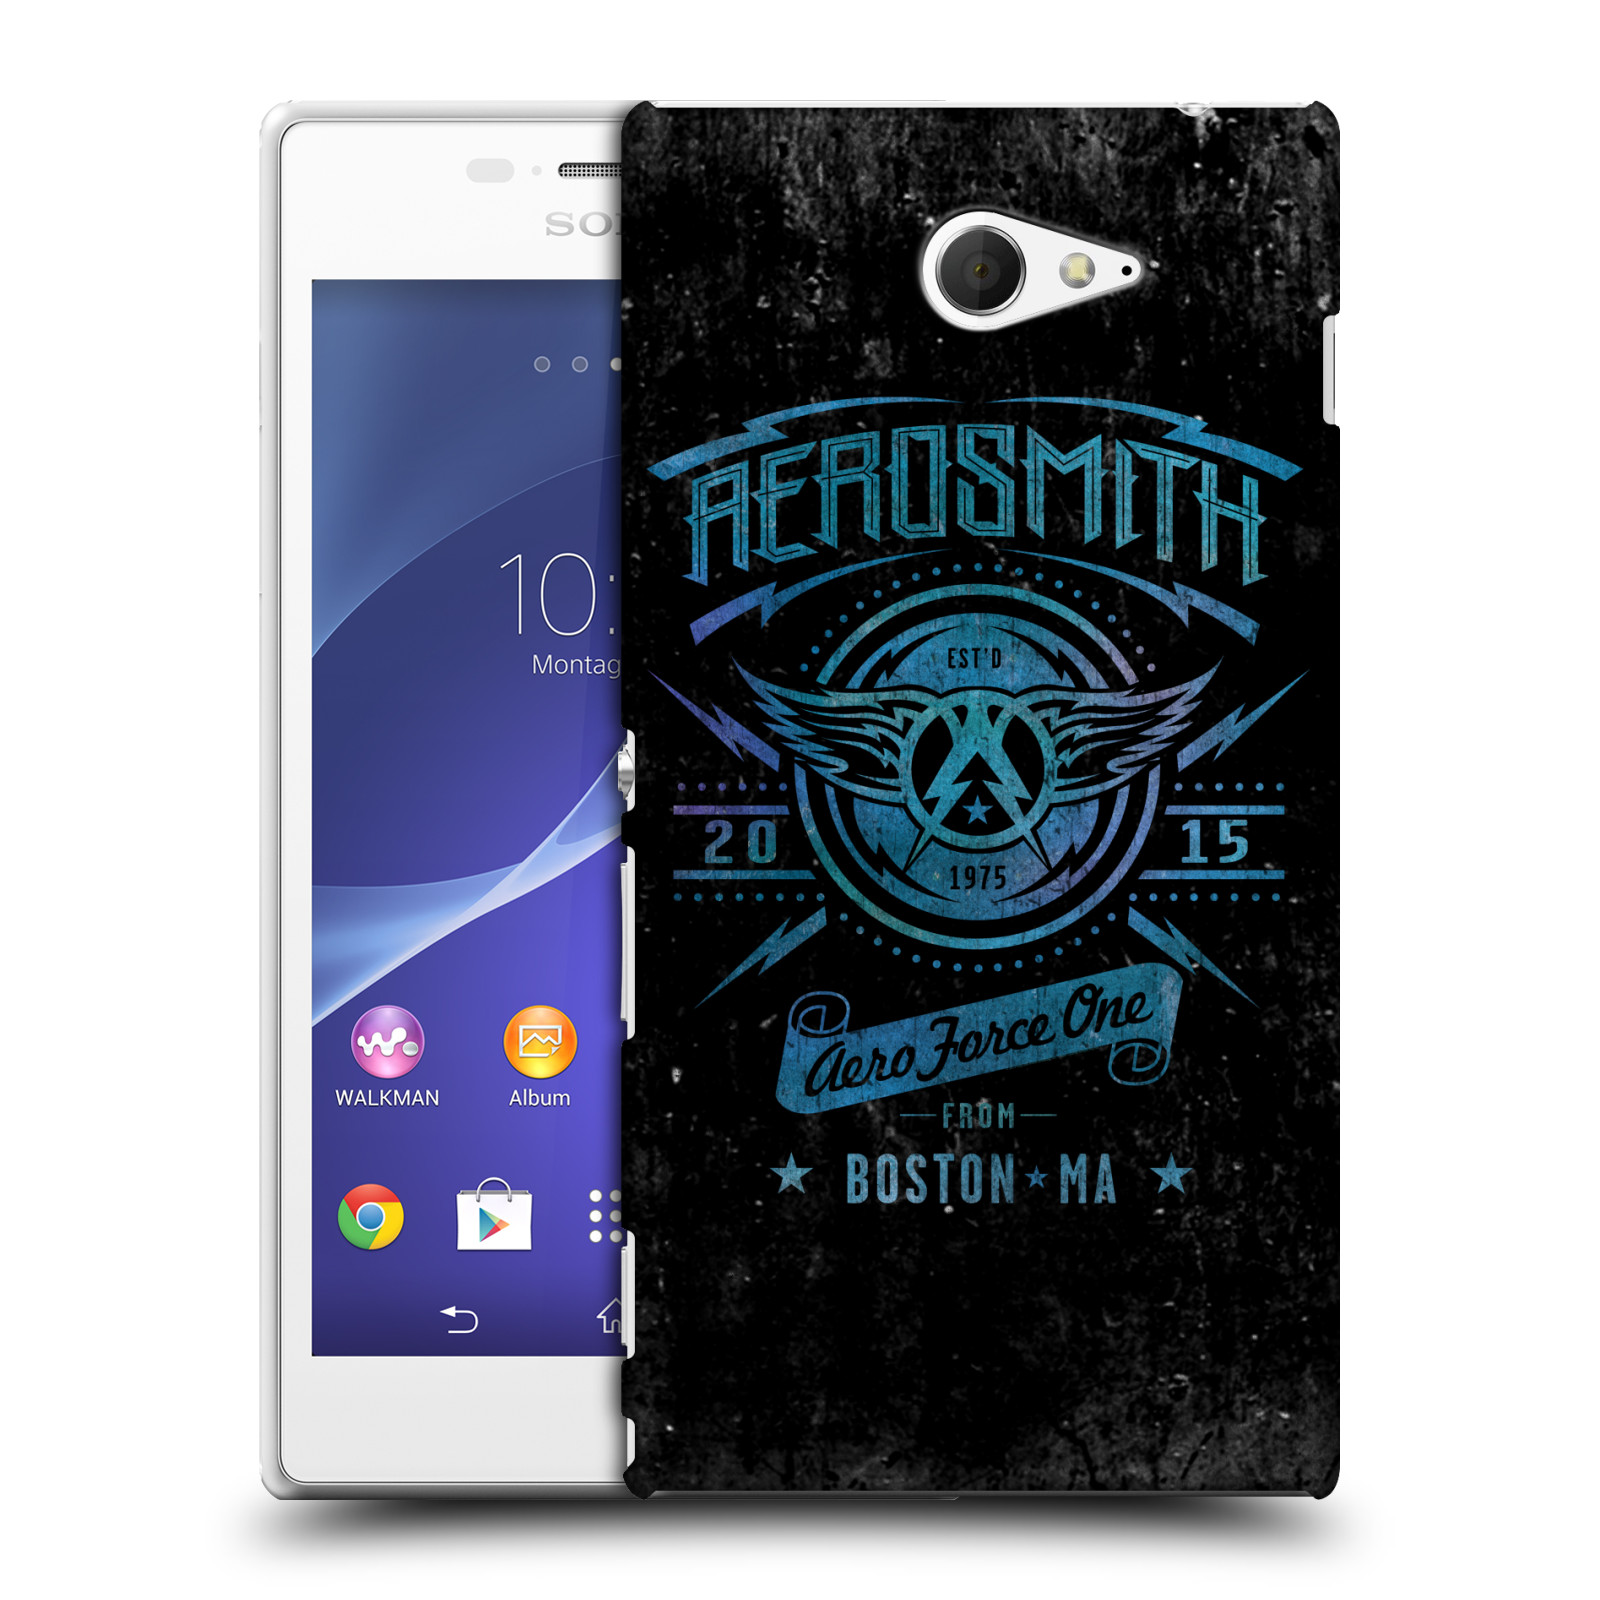 Plastové pouzdro na mobil Sony Xperia M2 D2303 HEAD CASE - Aerosmith - Aero Force One